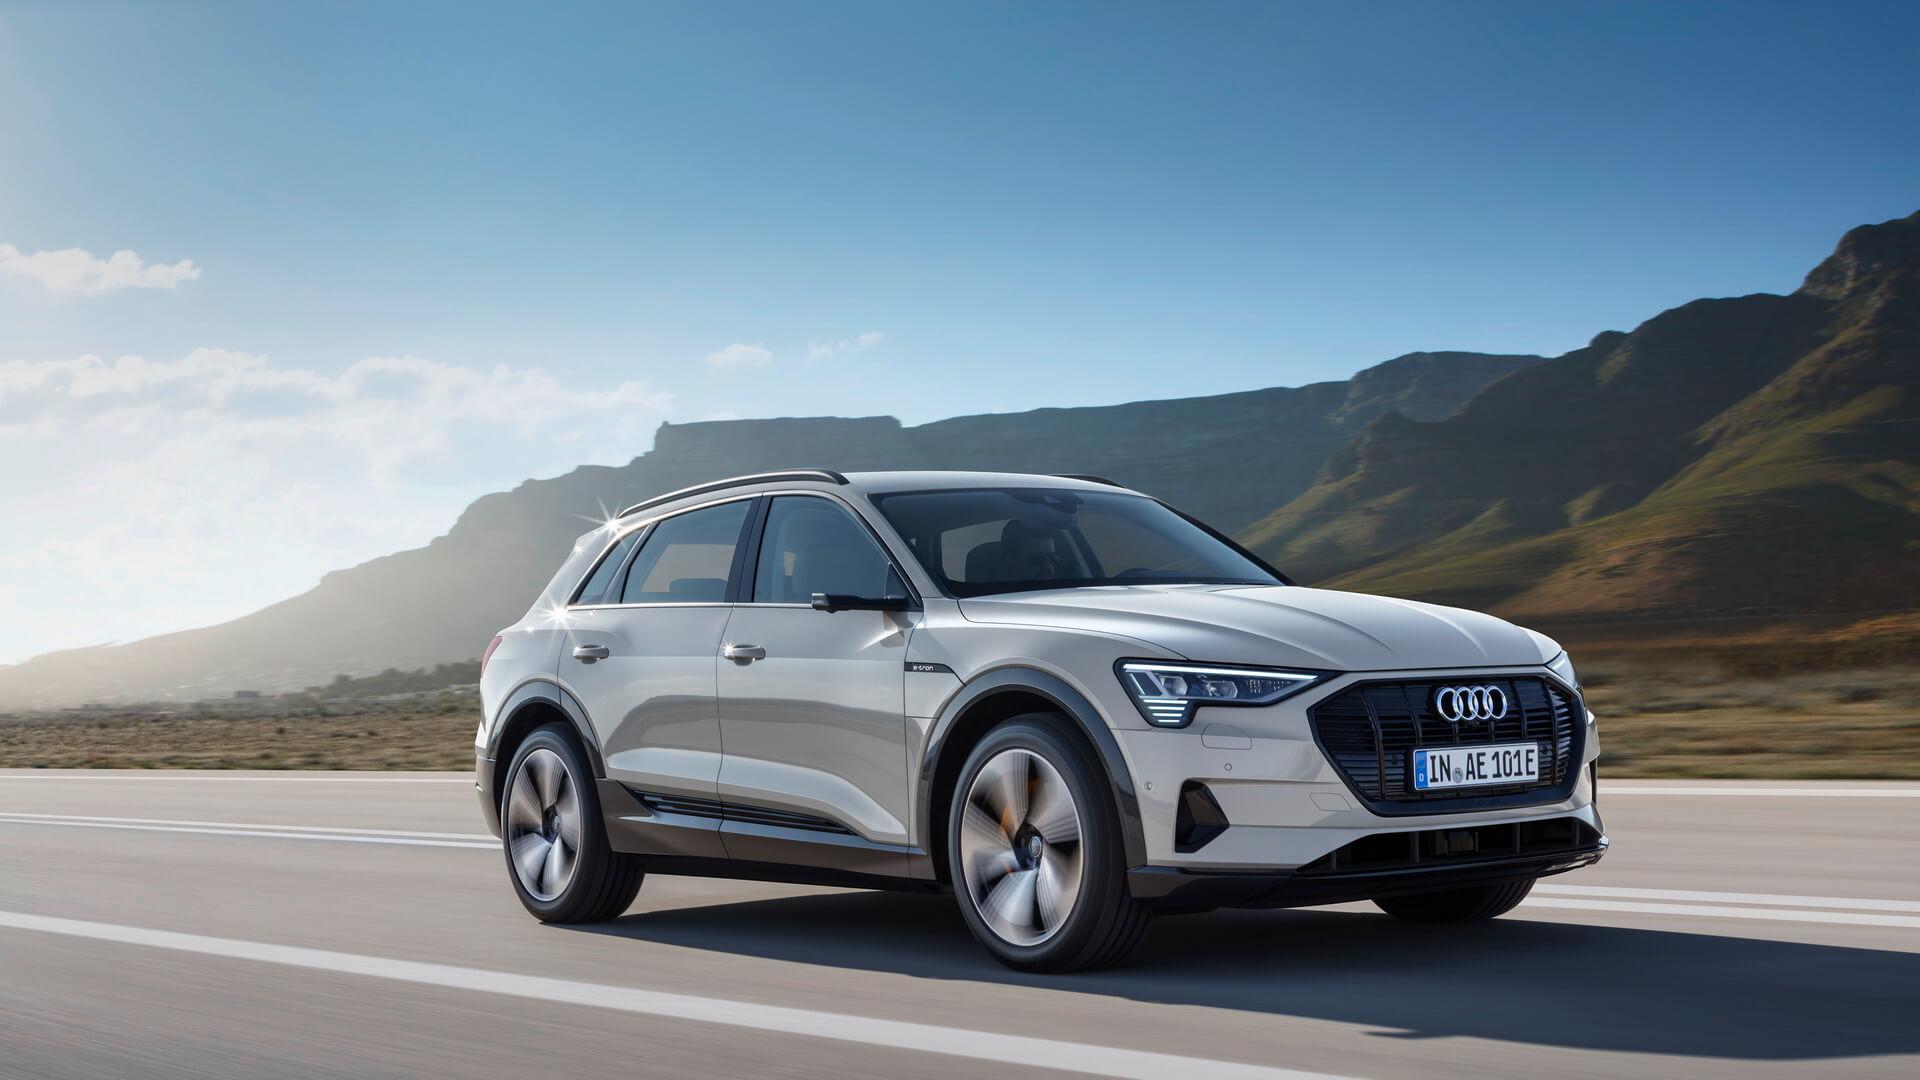 Фотография экоавто Audi e-tron 55 quattro